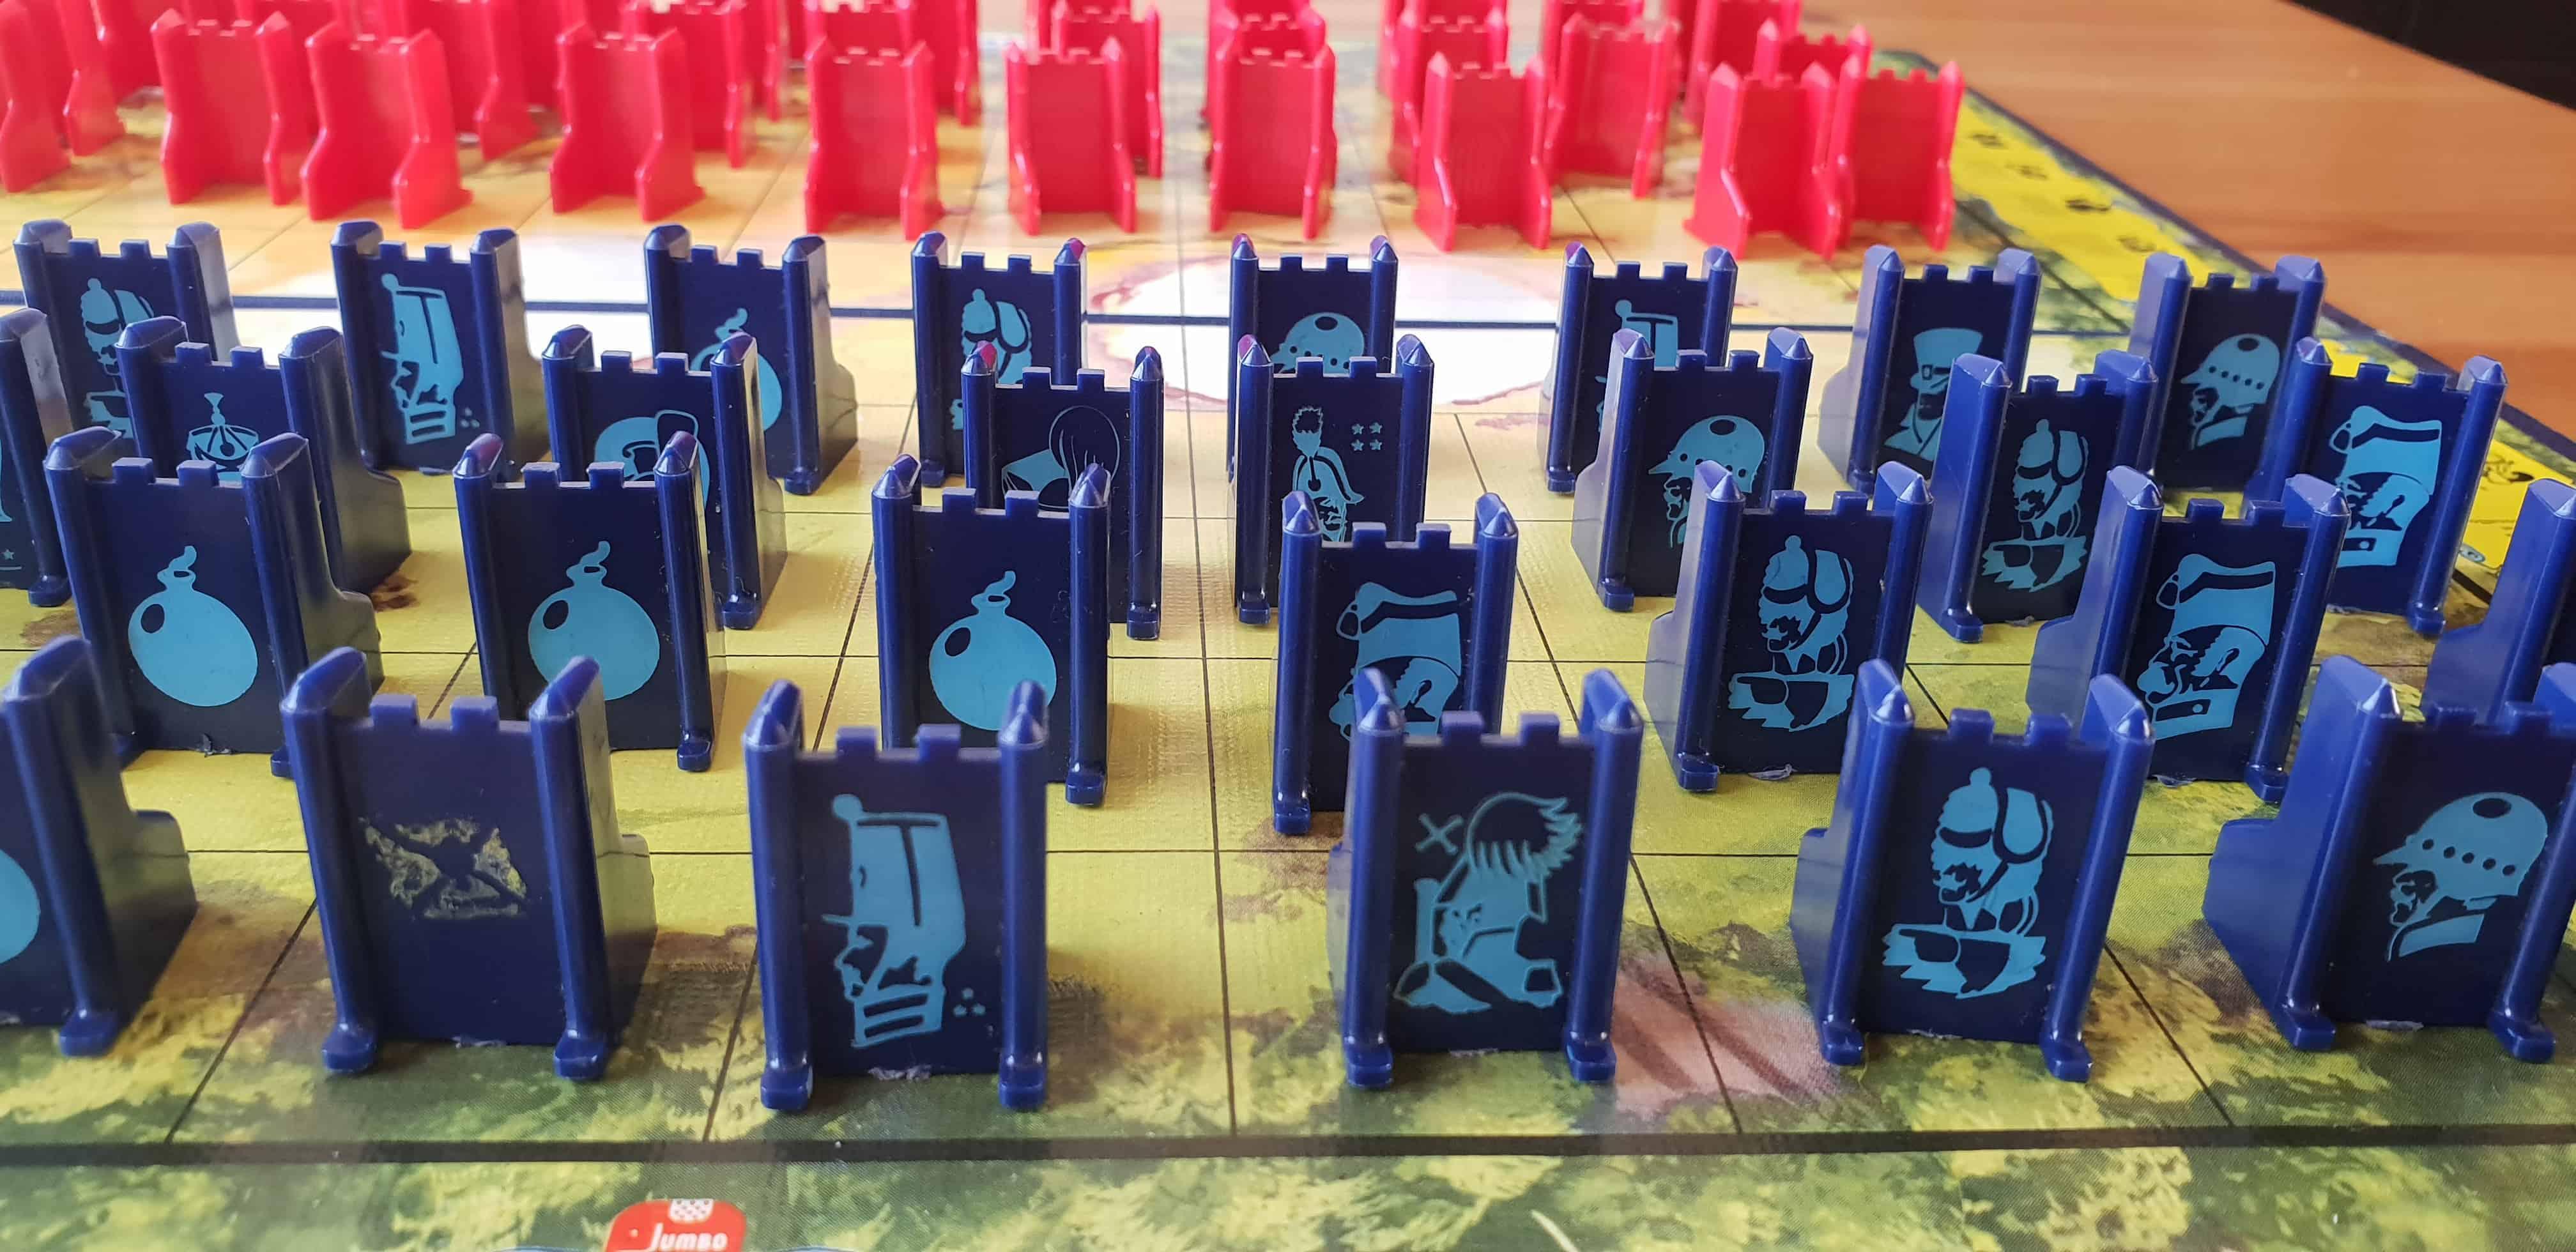 stratego-bodspel-speel-stukken